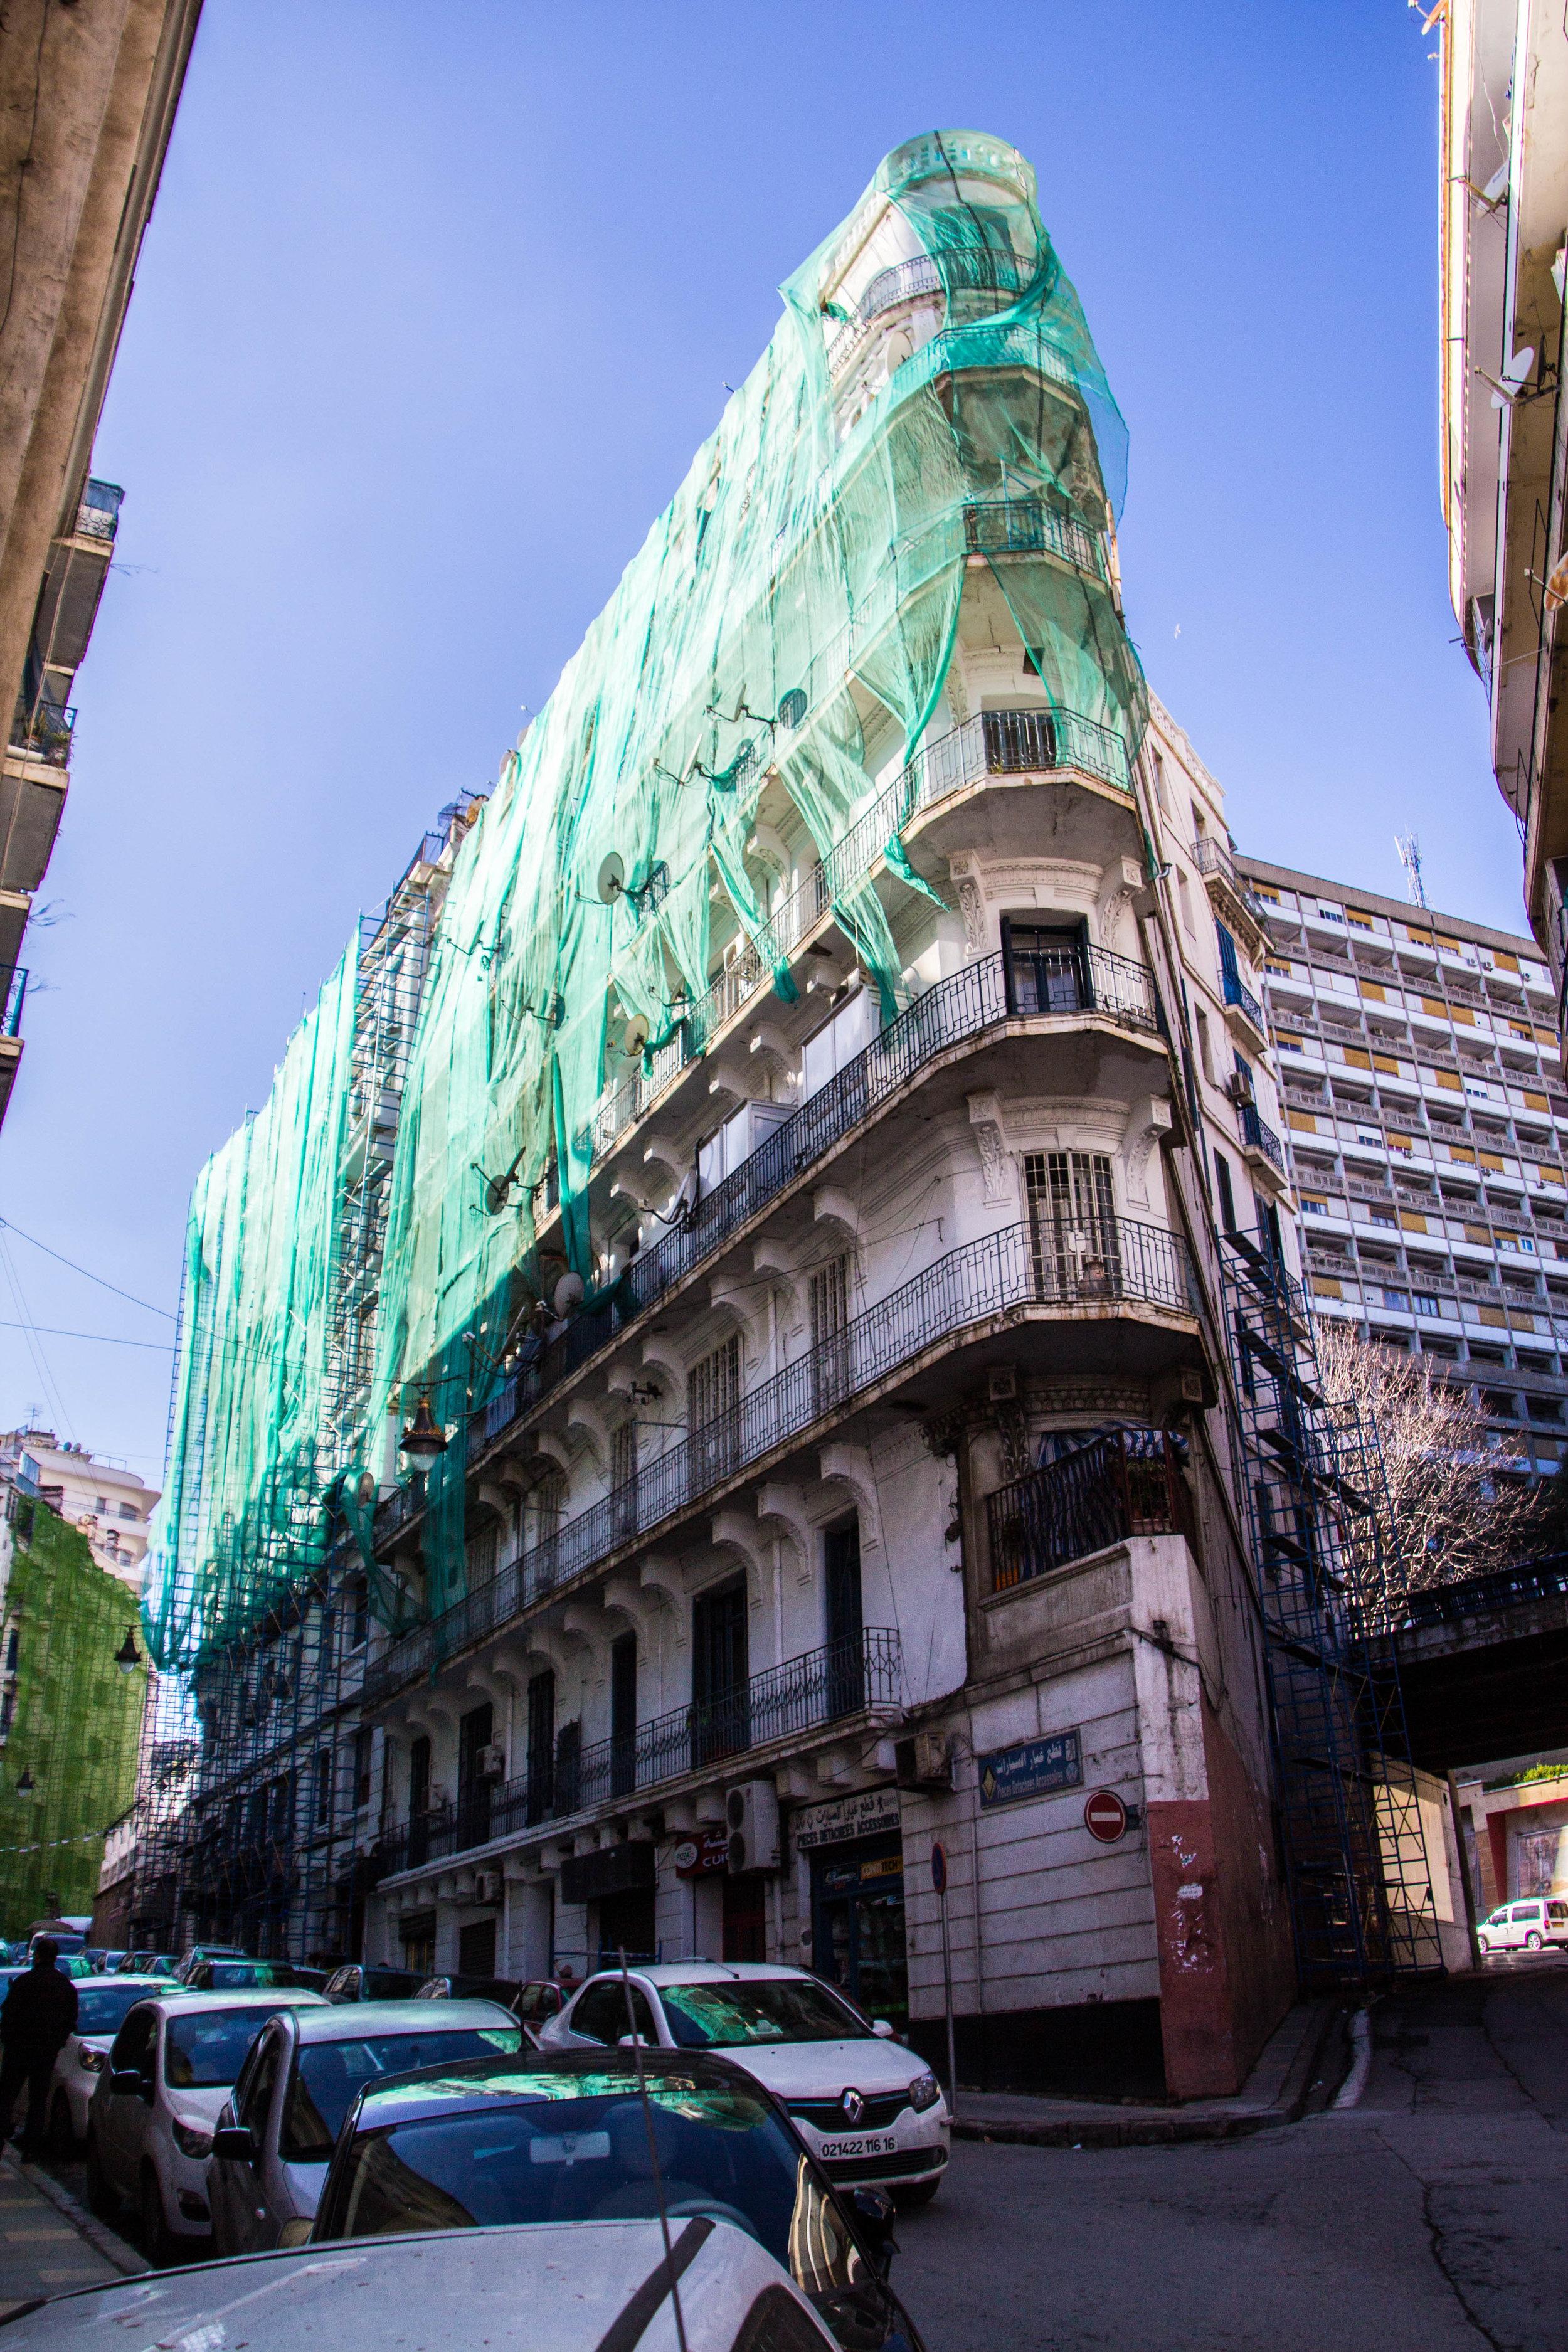 streets-algiers-algeria-15.jpg